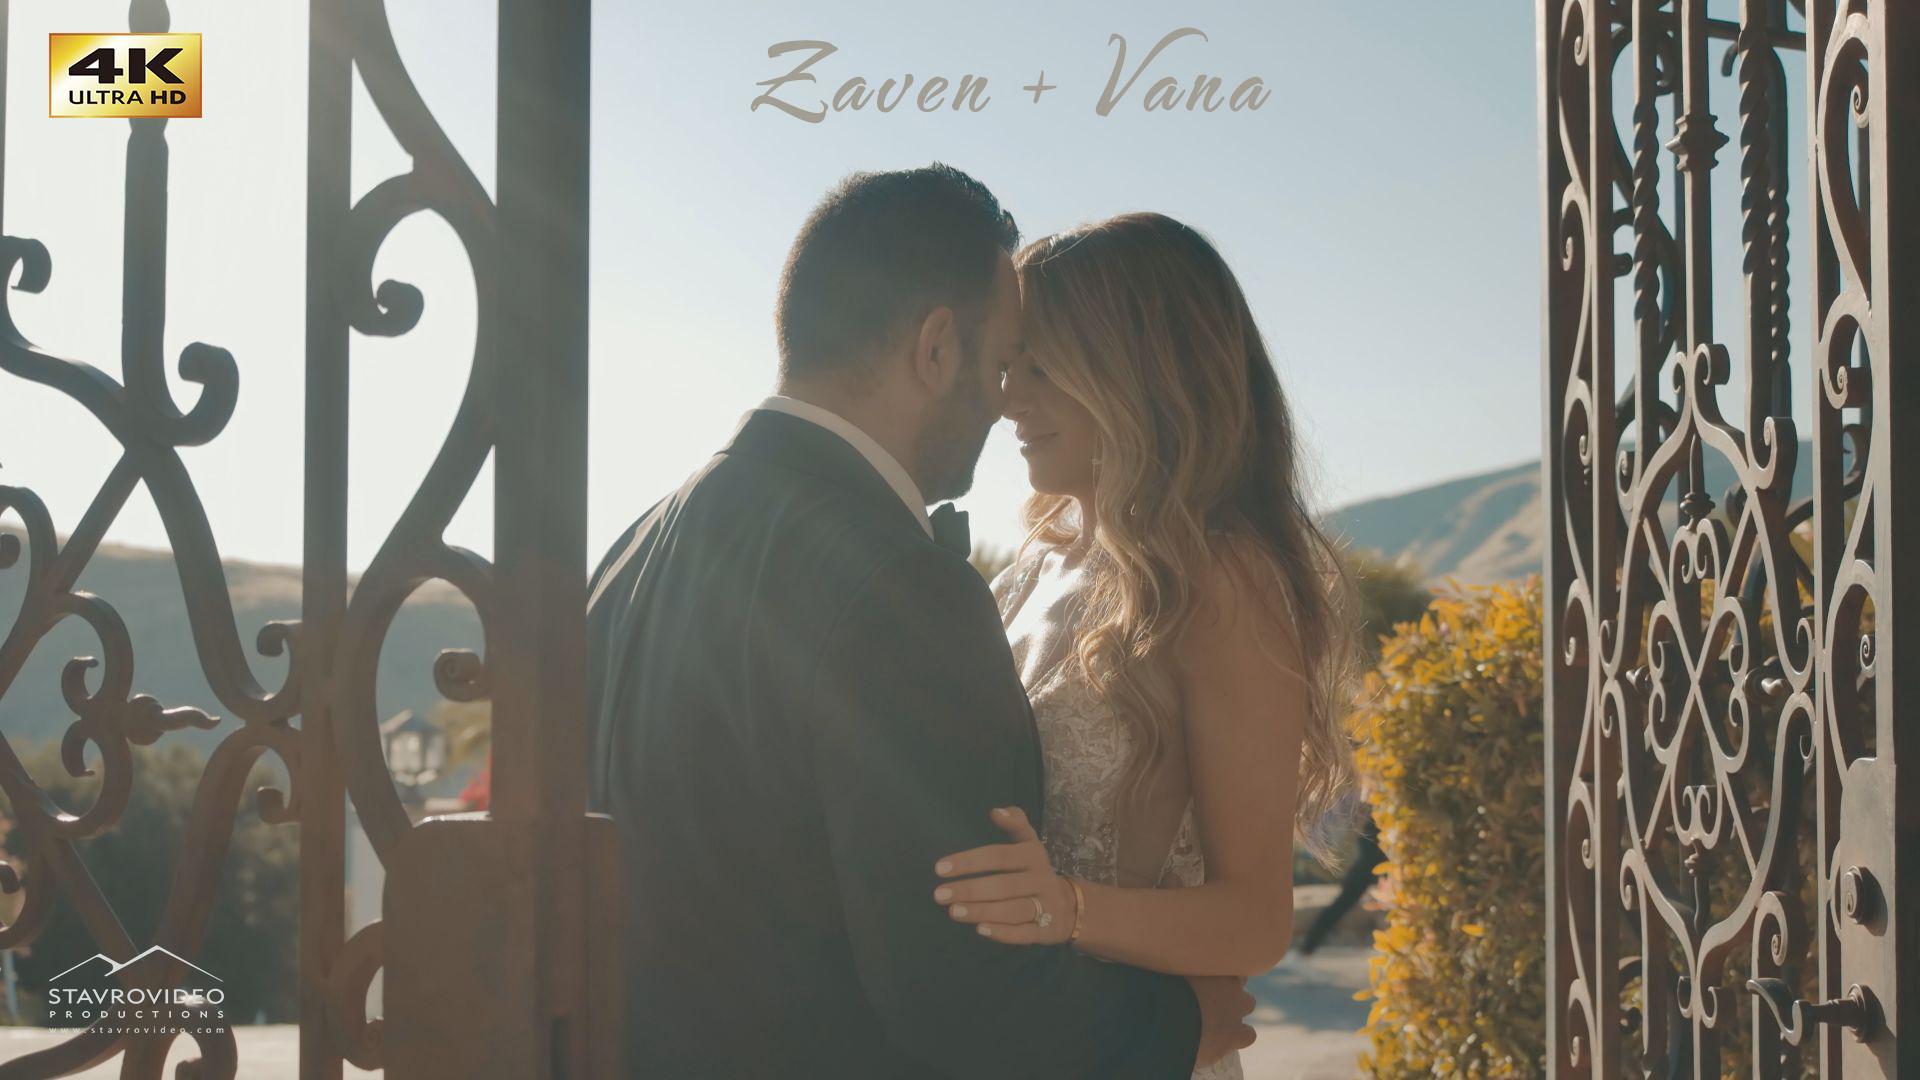 Zaven + Vana | Los Angeles, California | Hummingbird Nest Ranch